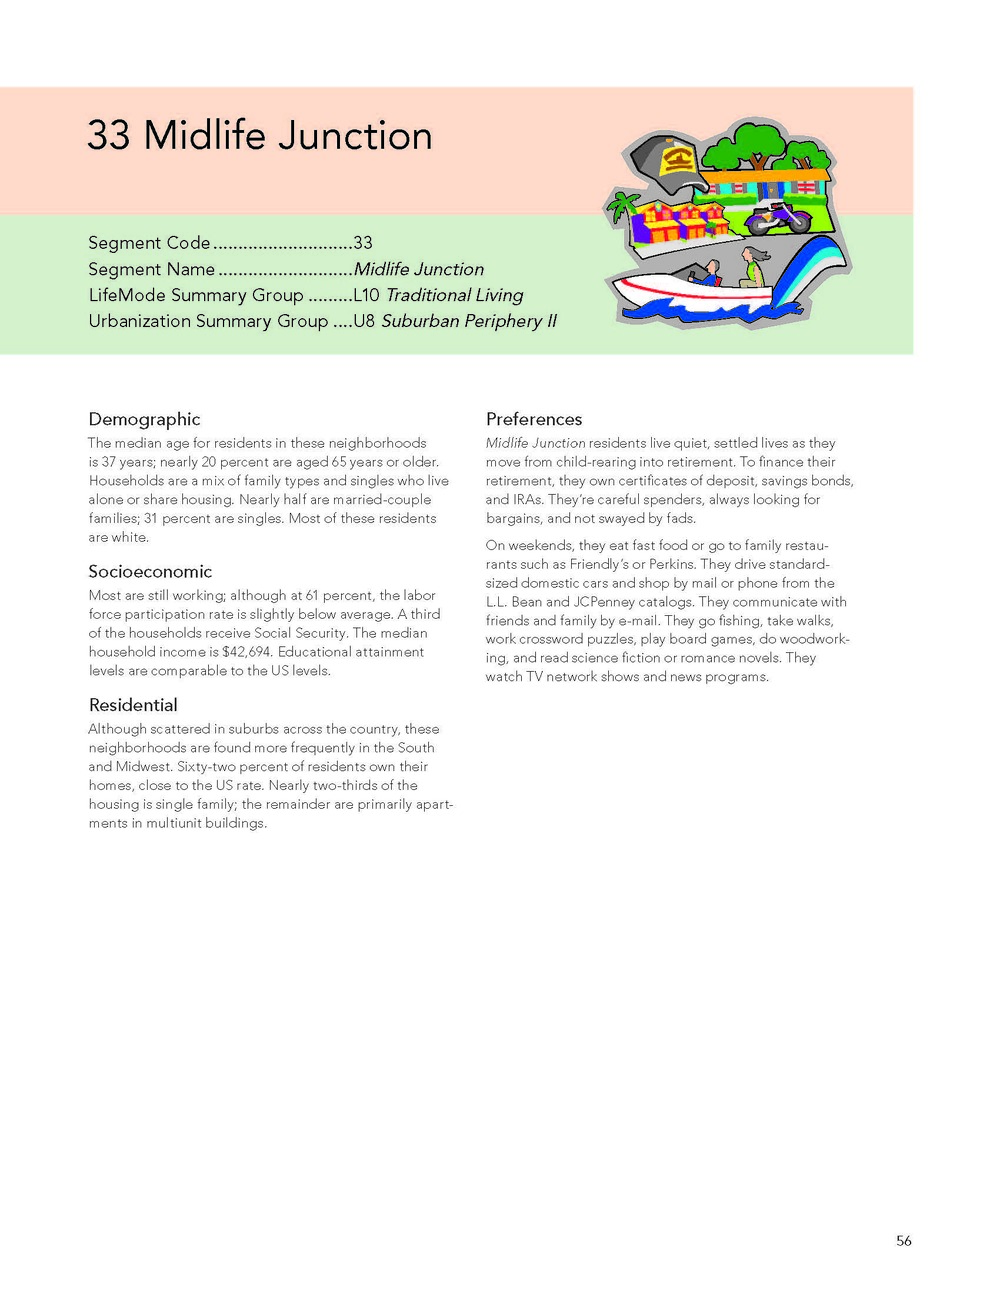 tapestry-segmentation_Page_59.jpg